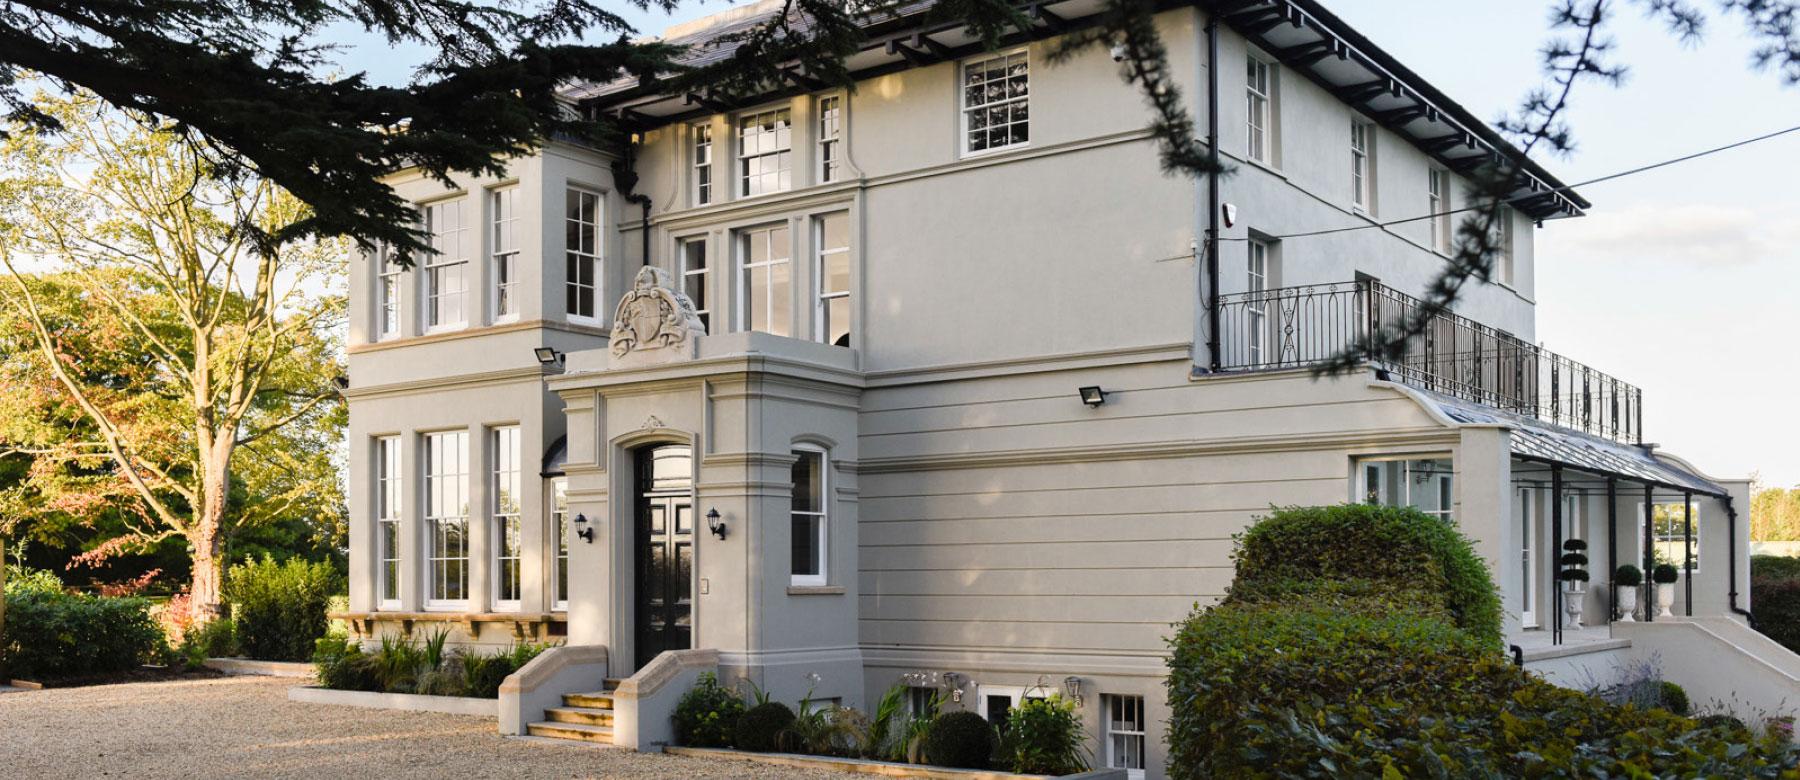 Venue services - a lovely hotel venue